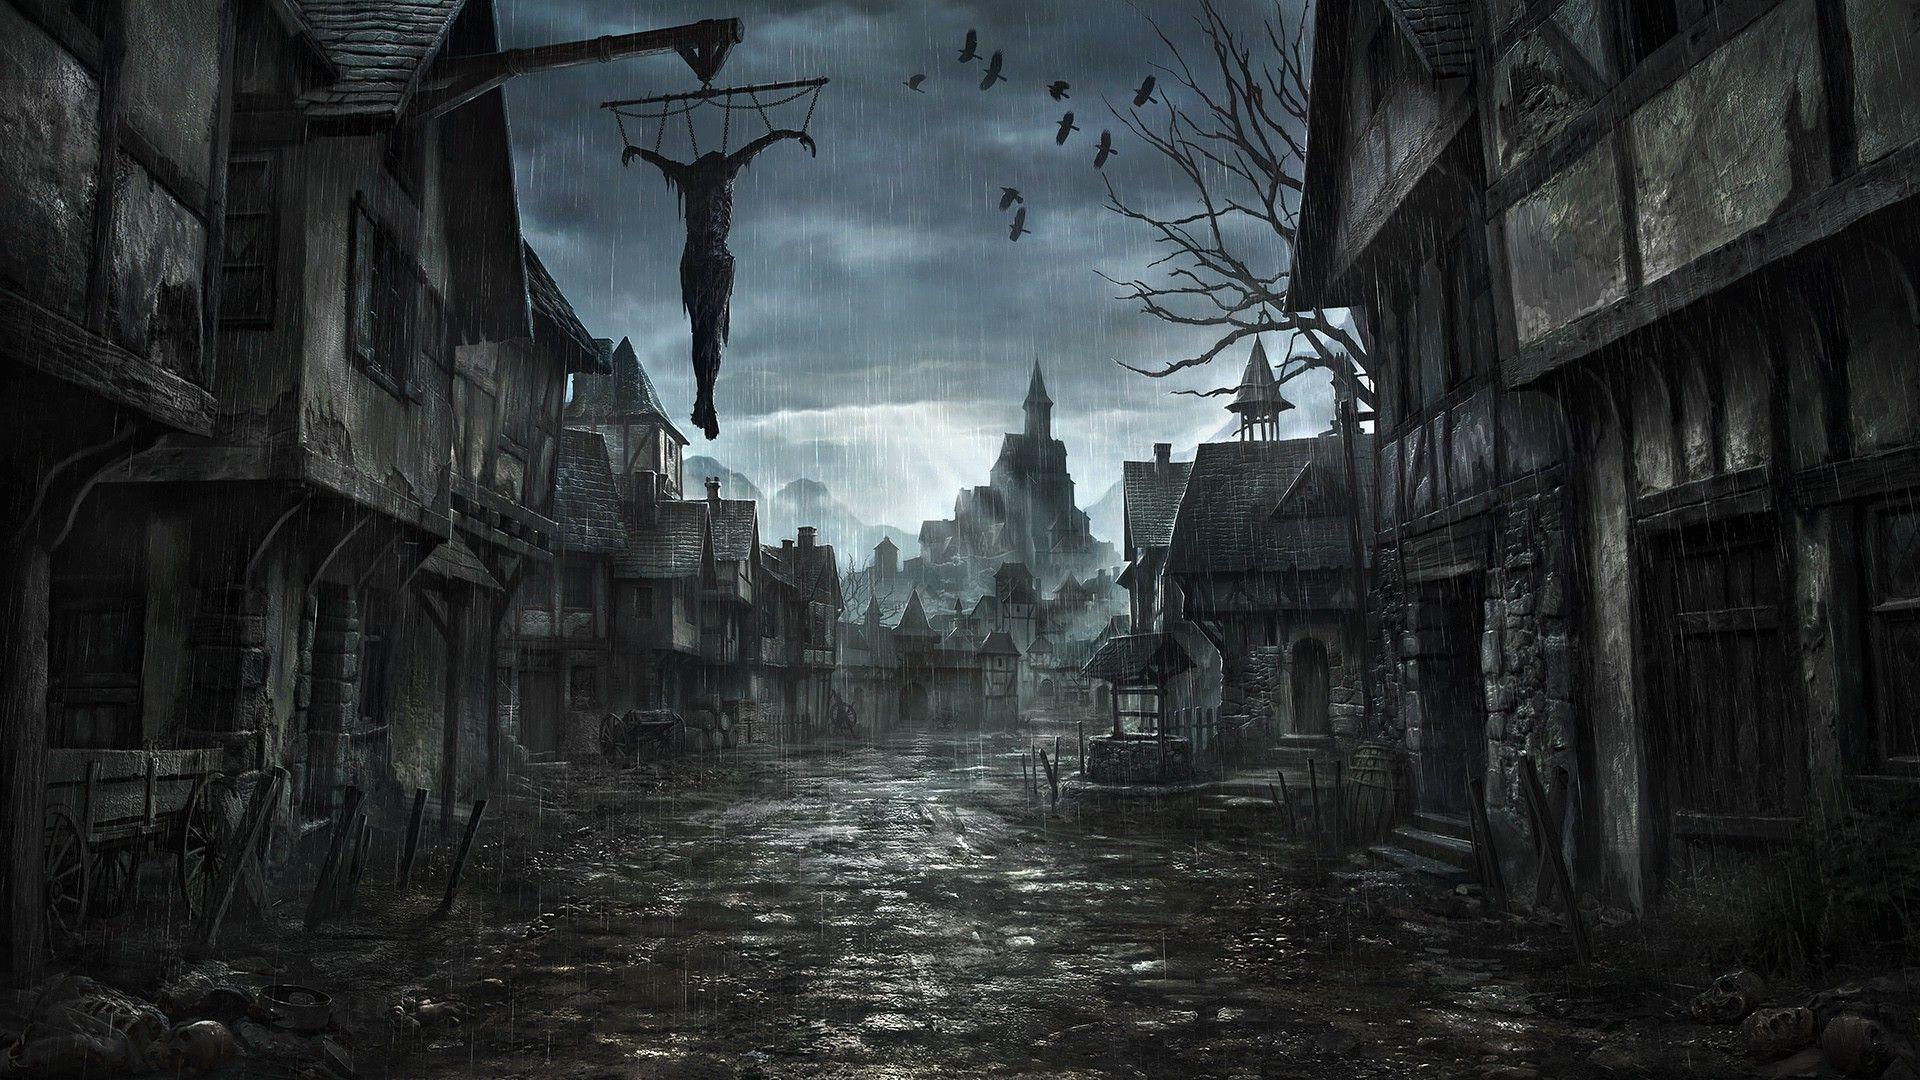 Rainy Village Street Fantasy Wallpaper Dark Art Paintings Dark Fantasy Art Creepy Backgrounds